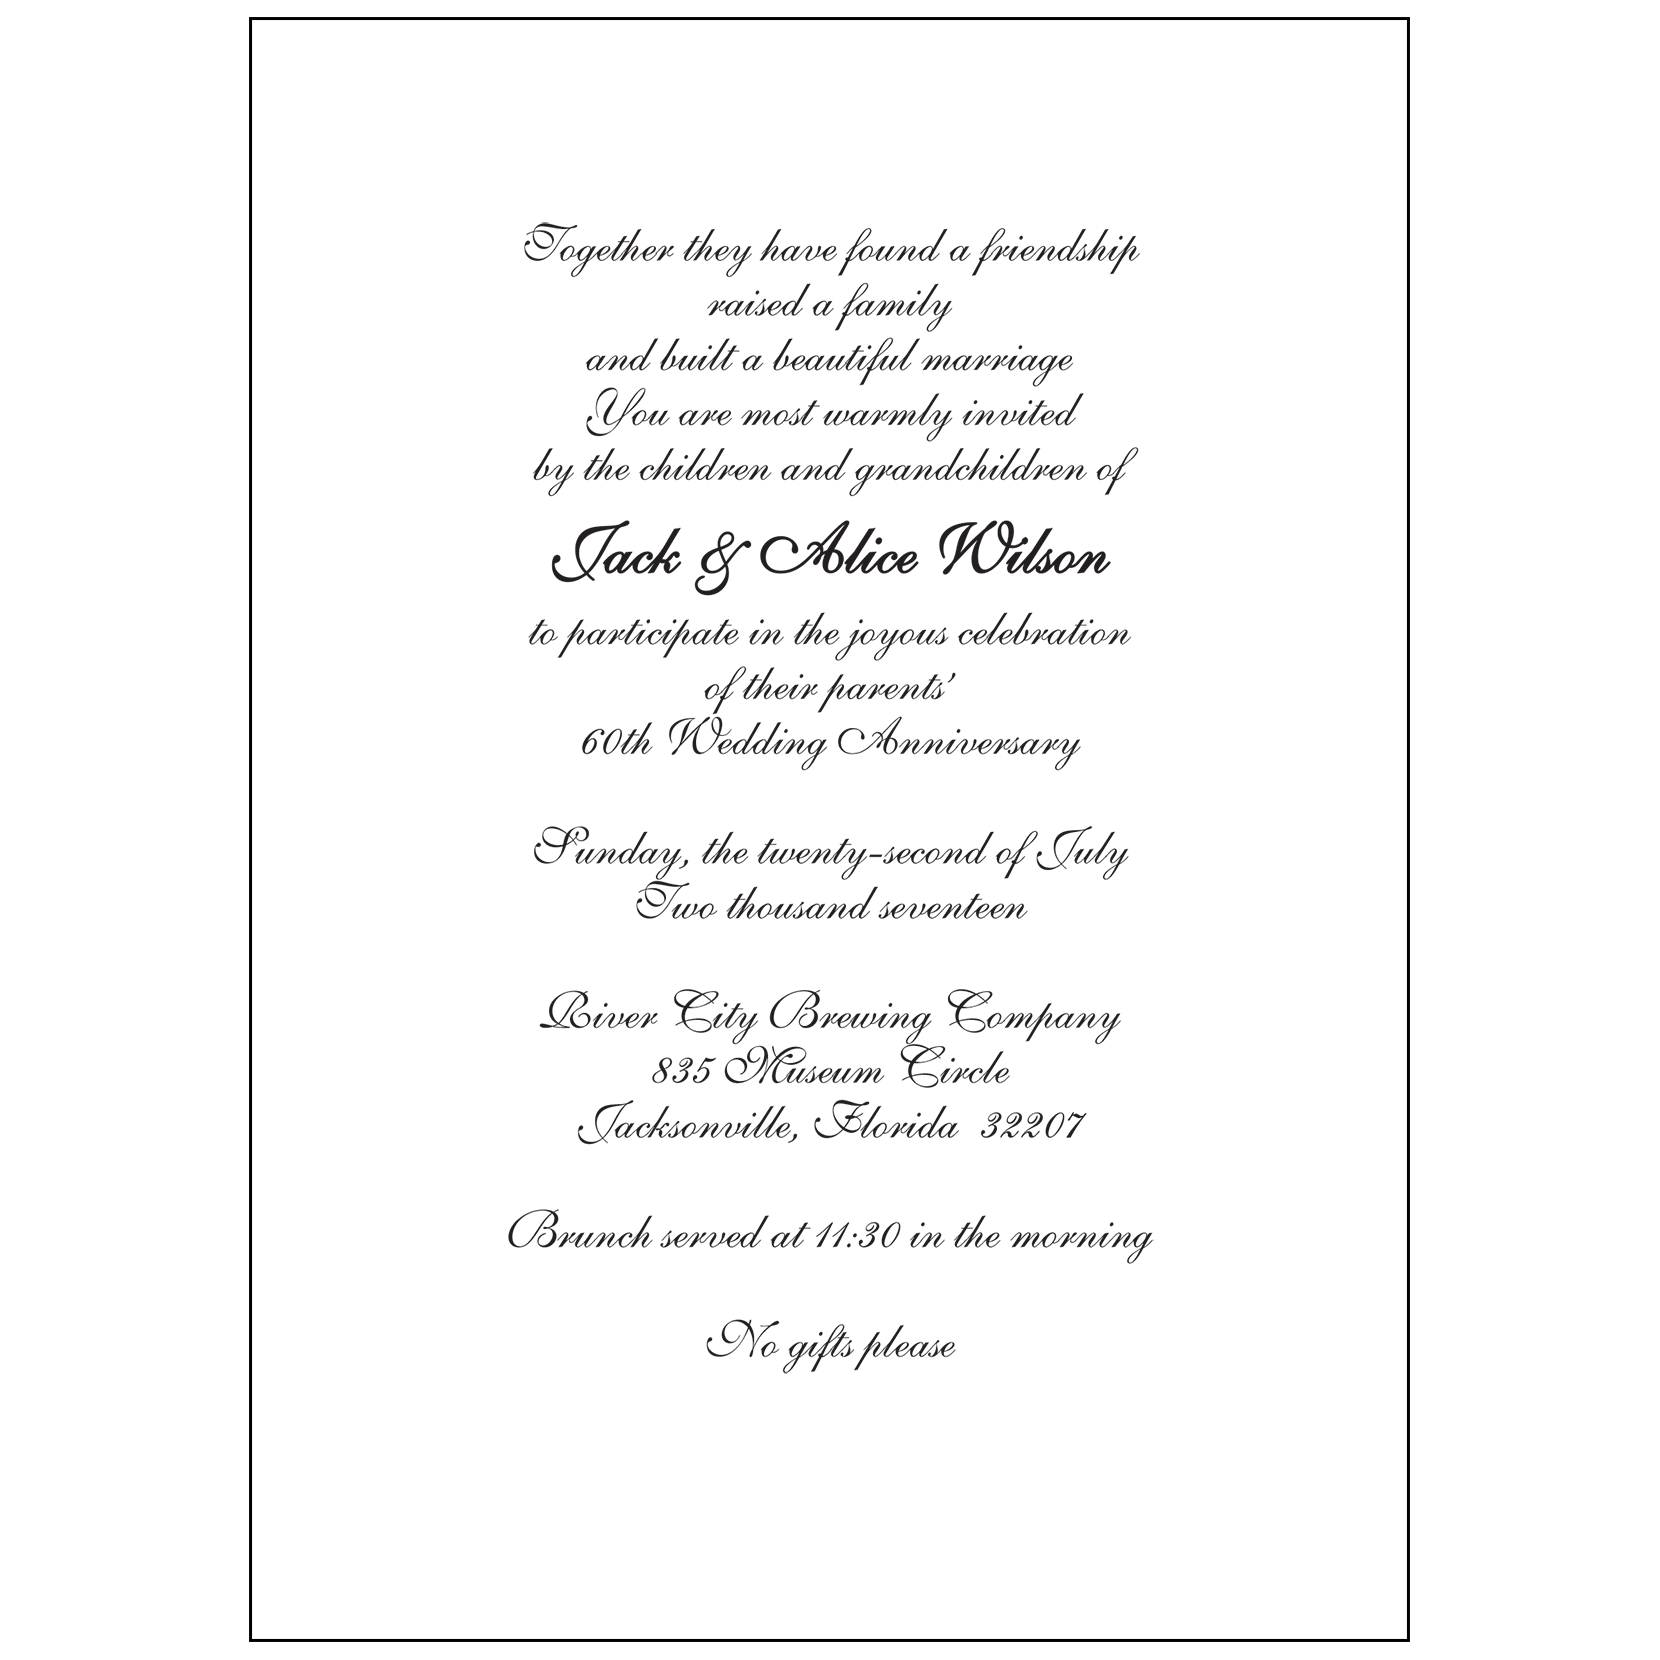 60th Wedding Anniversary Party Invitation, Style 1G – IPV Studio